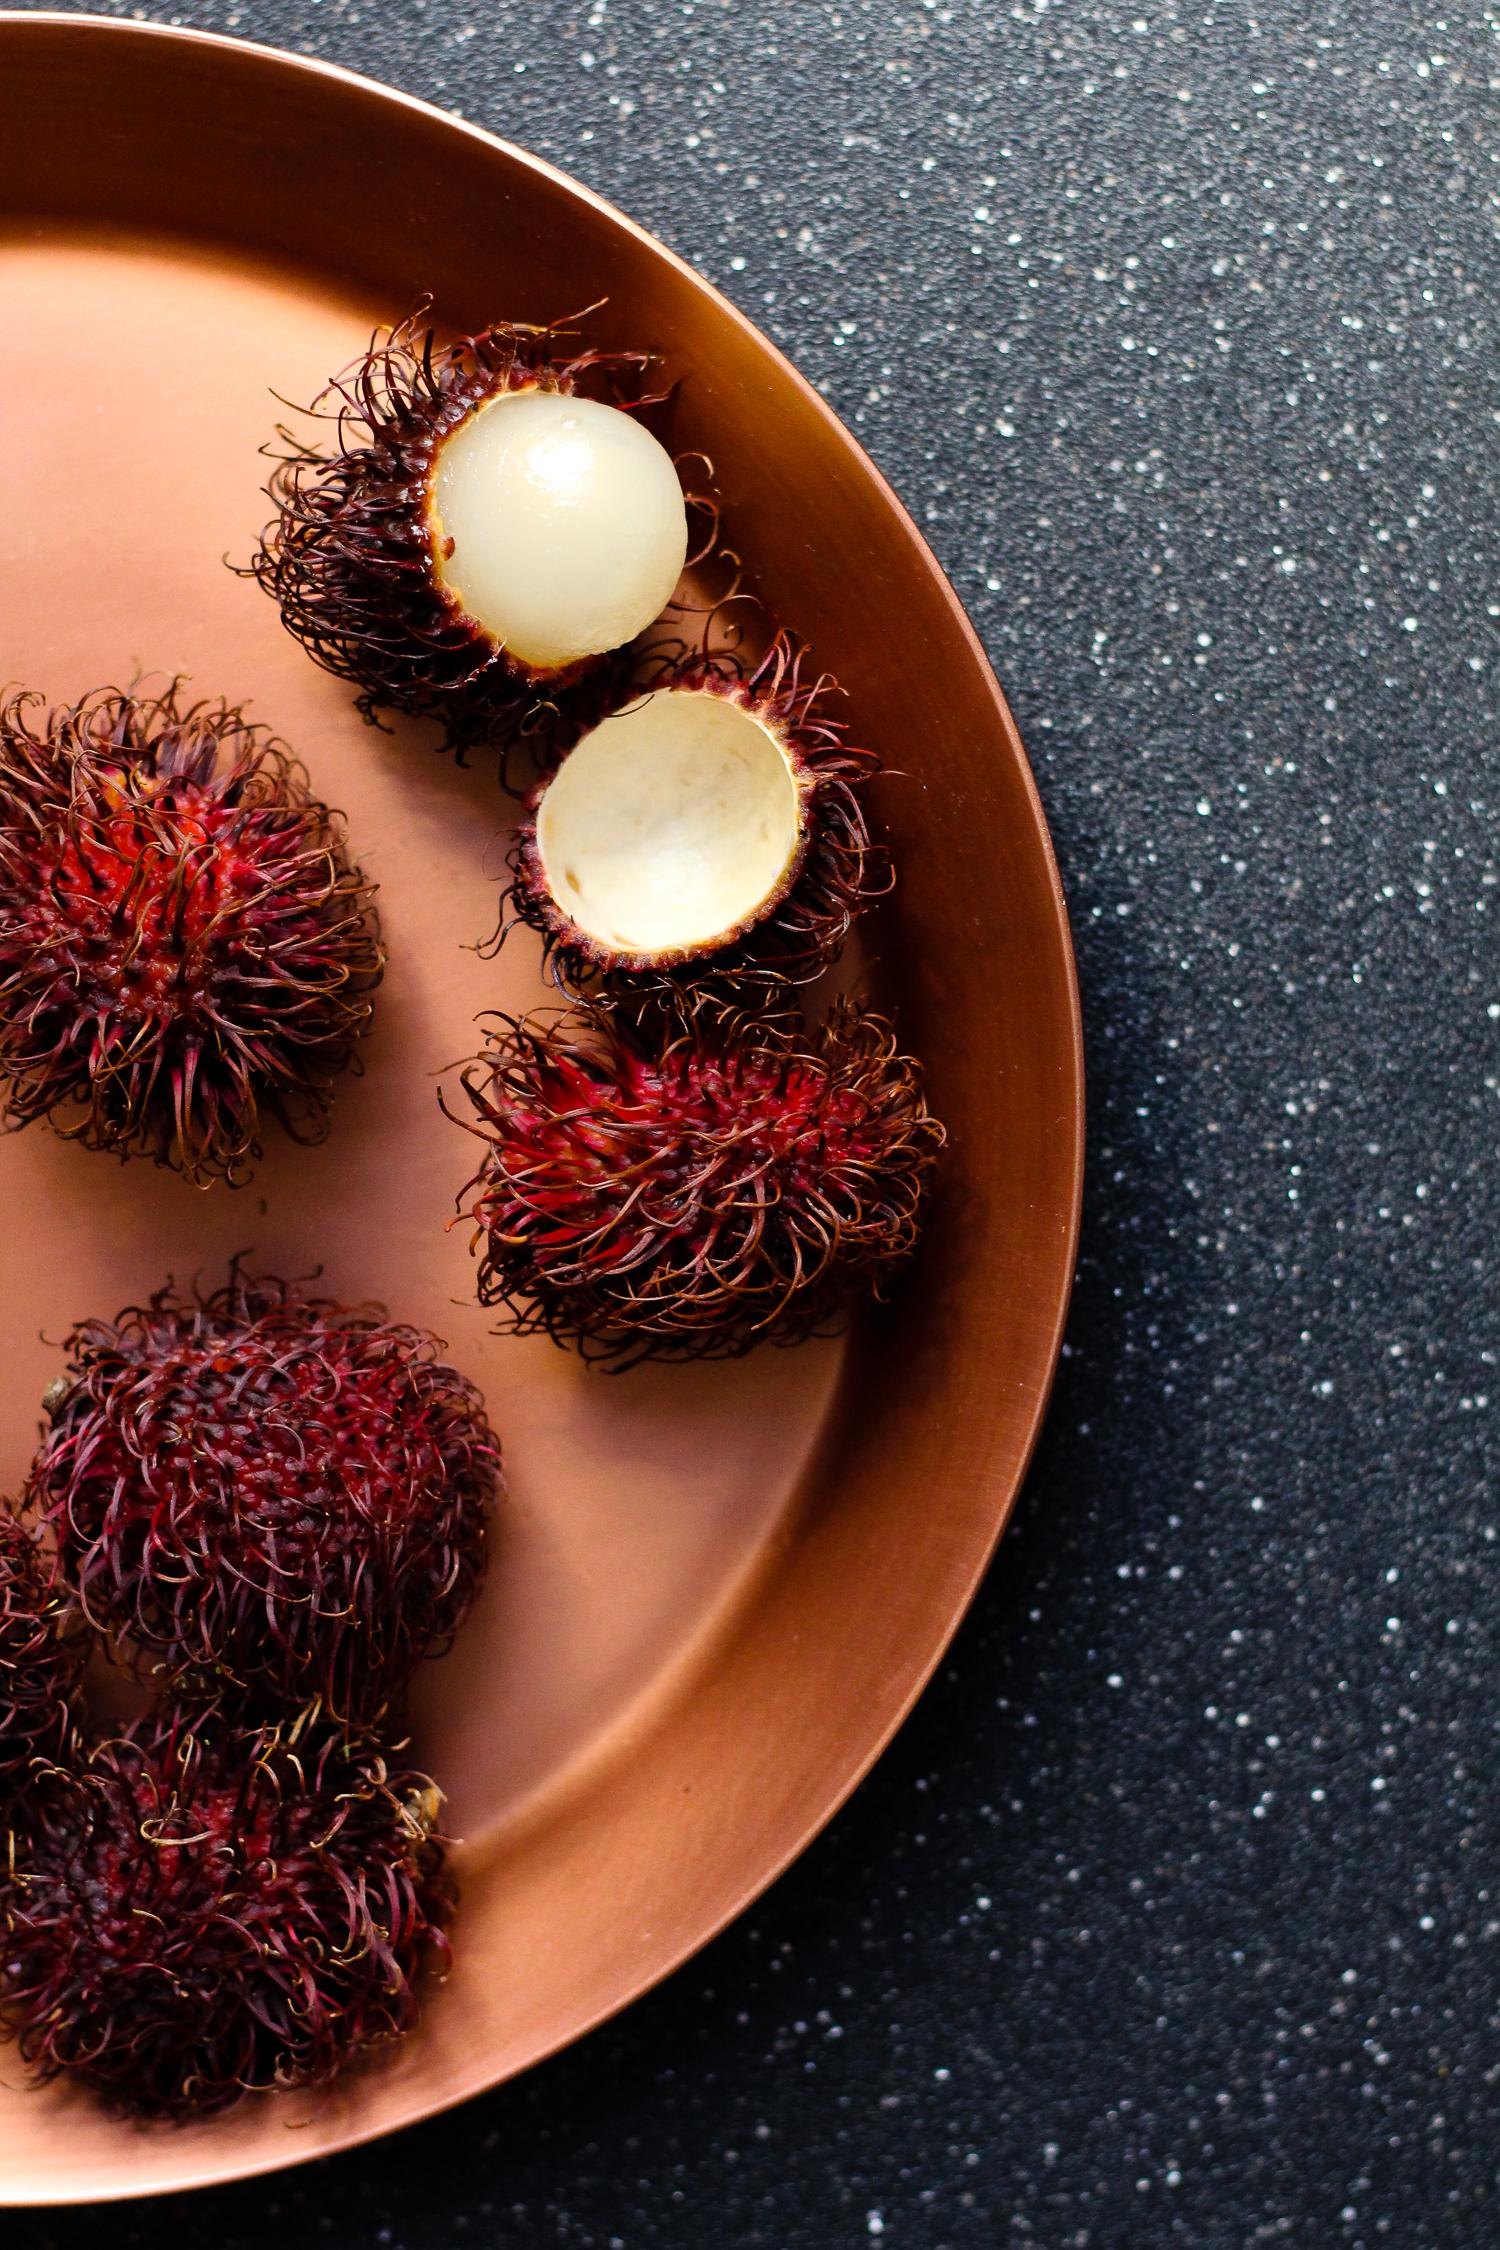 Rambutan Fruit - Put Your Money Where Your Politics Are